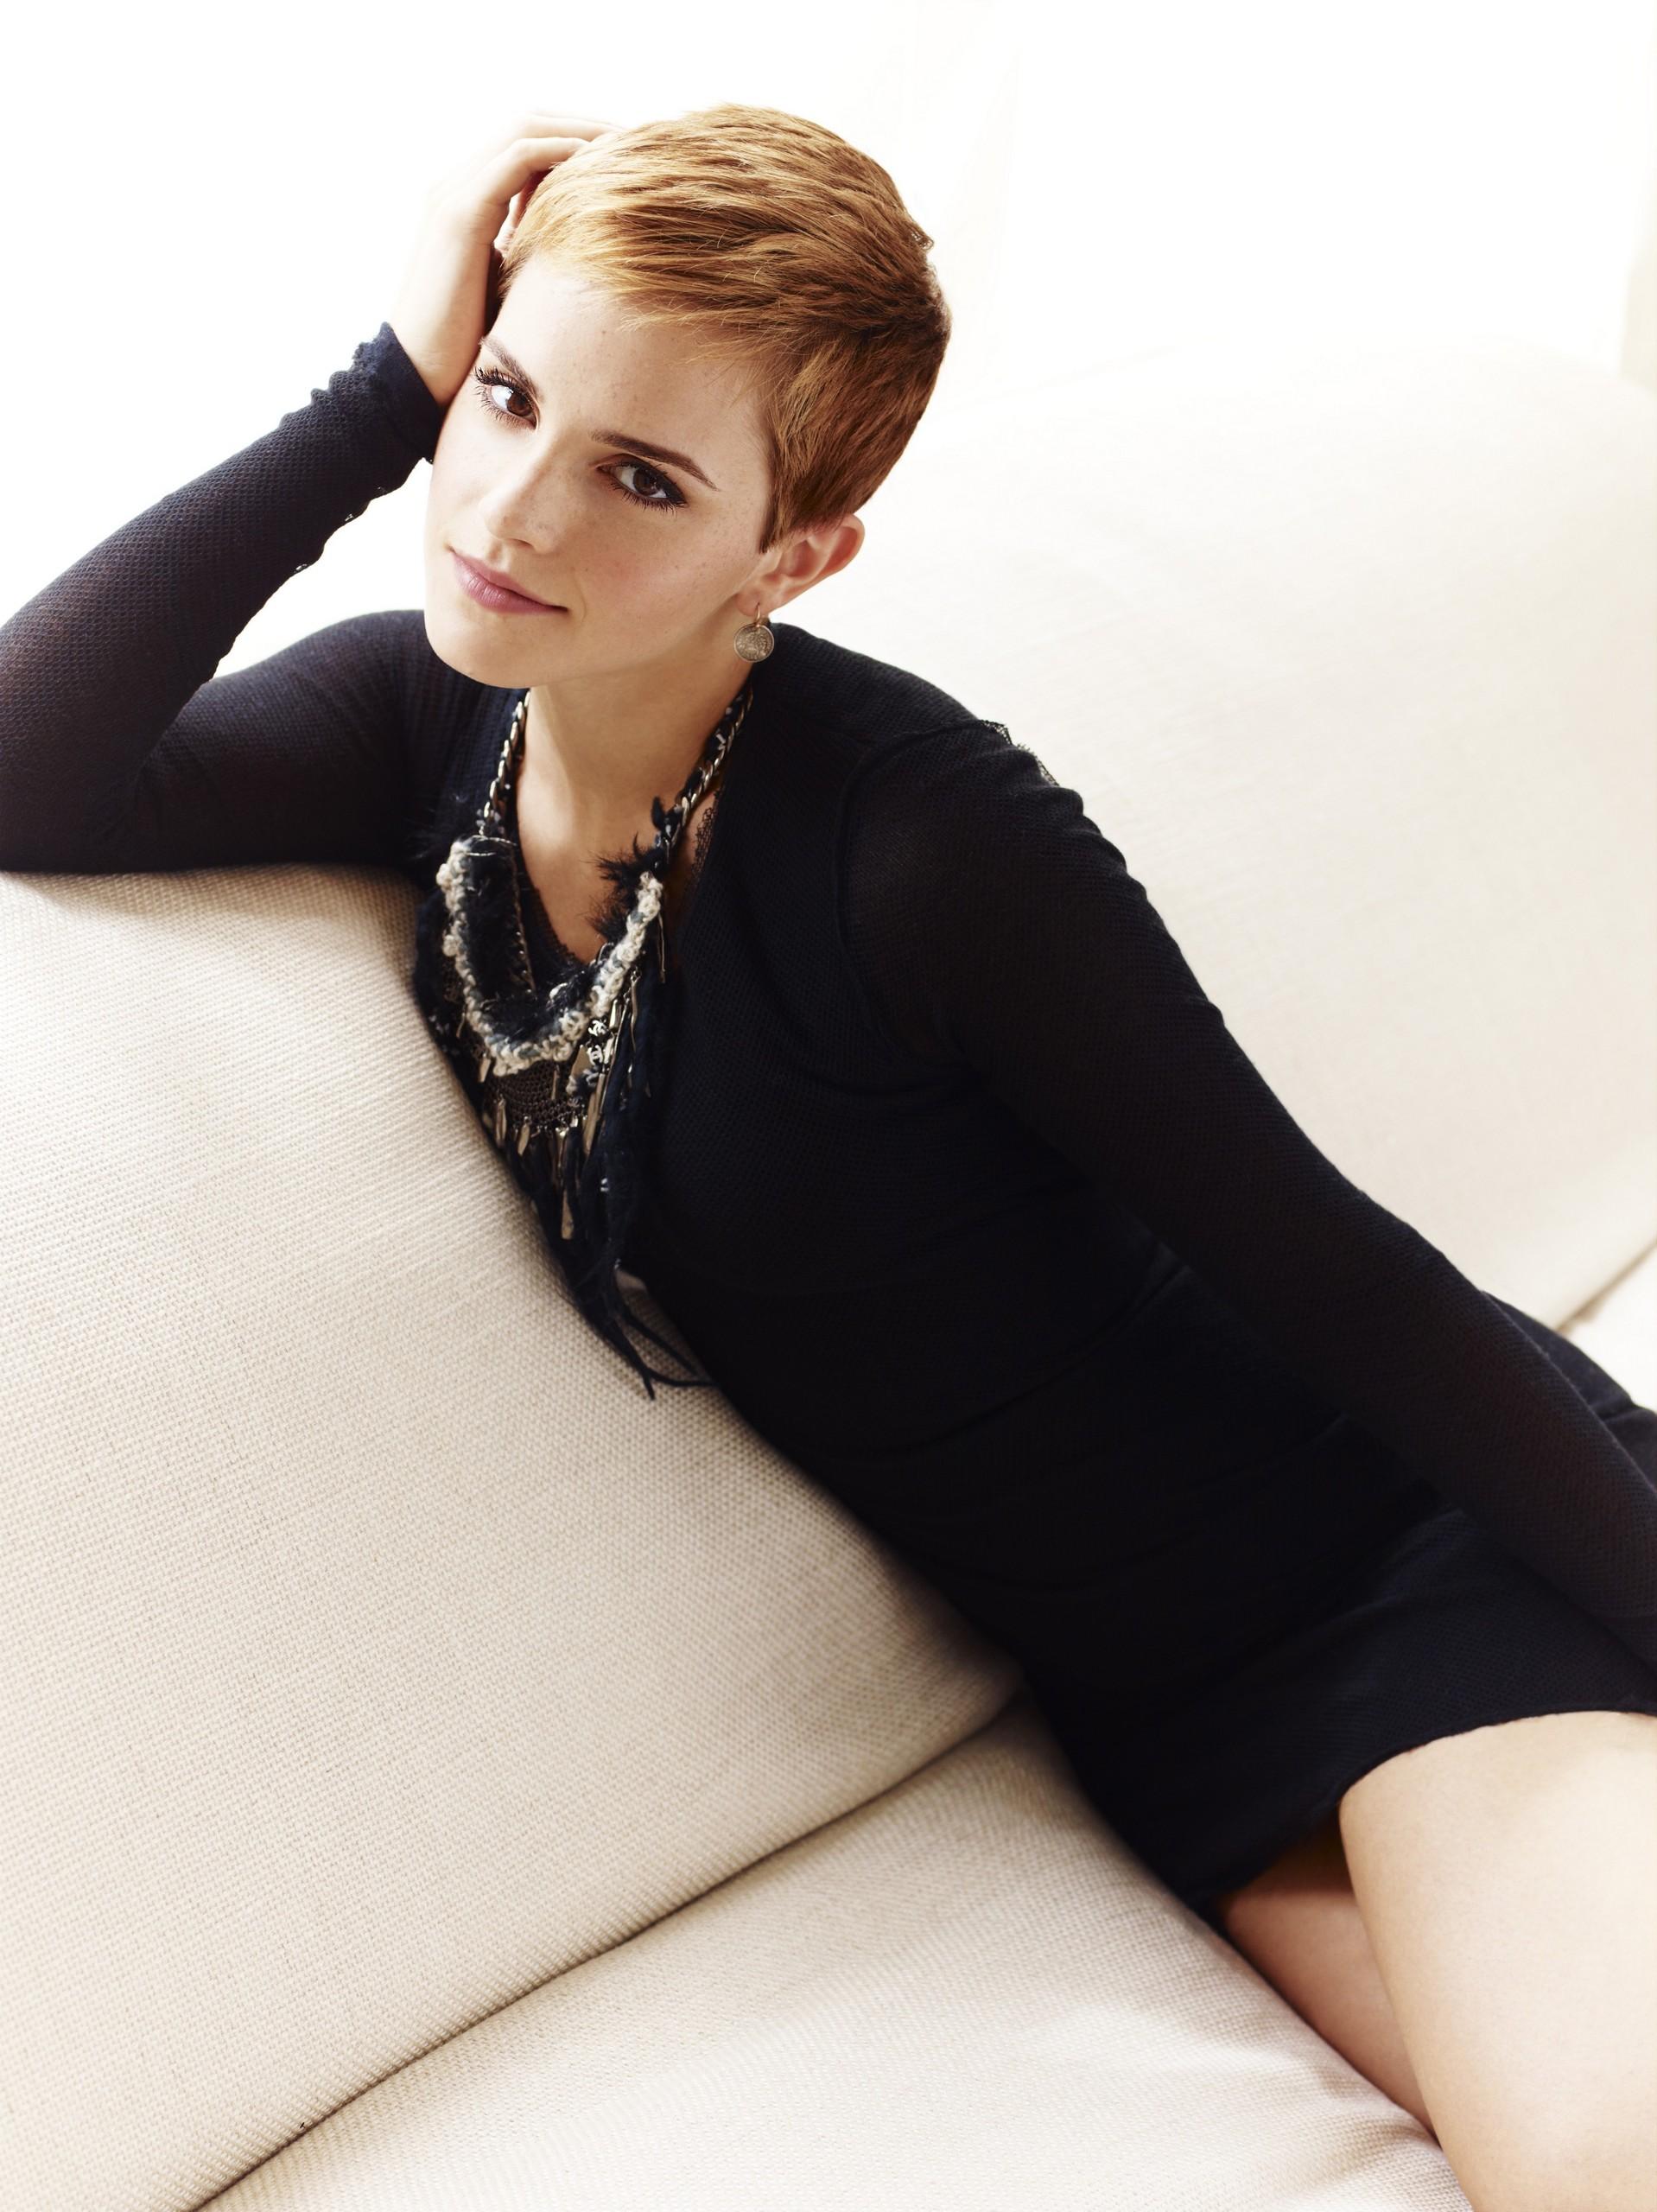 Emma Watson - Mariano Vivanco photoshoot HQ - harry-potter photo